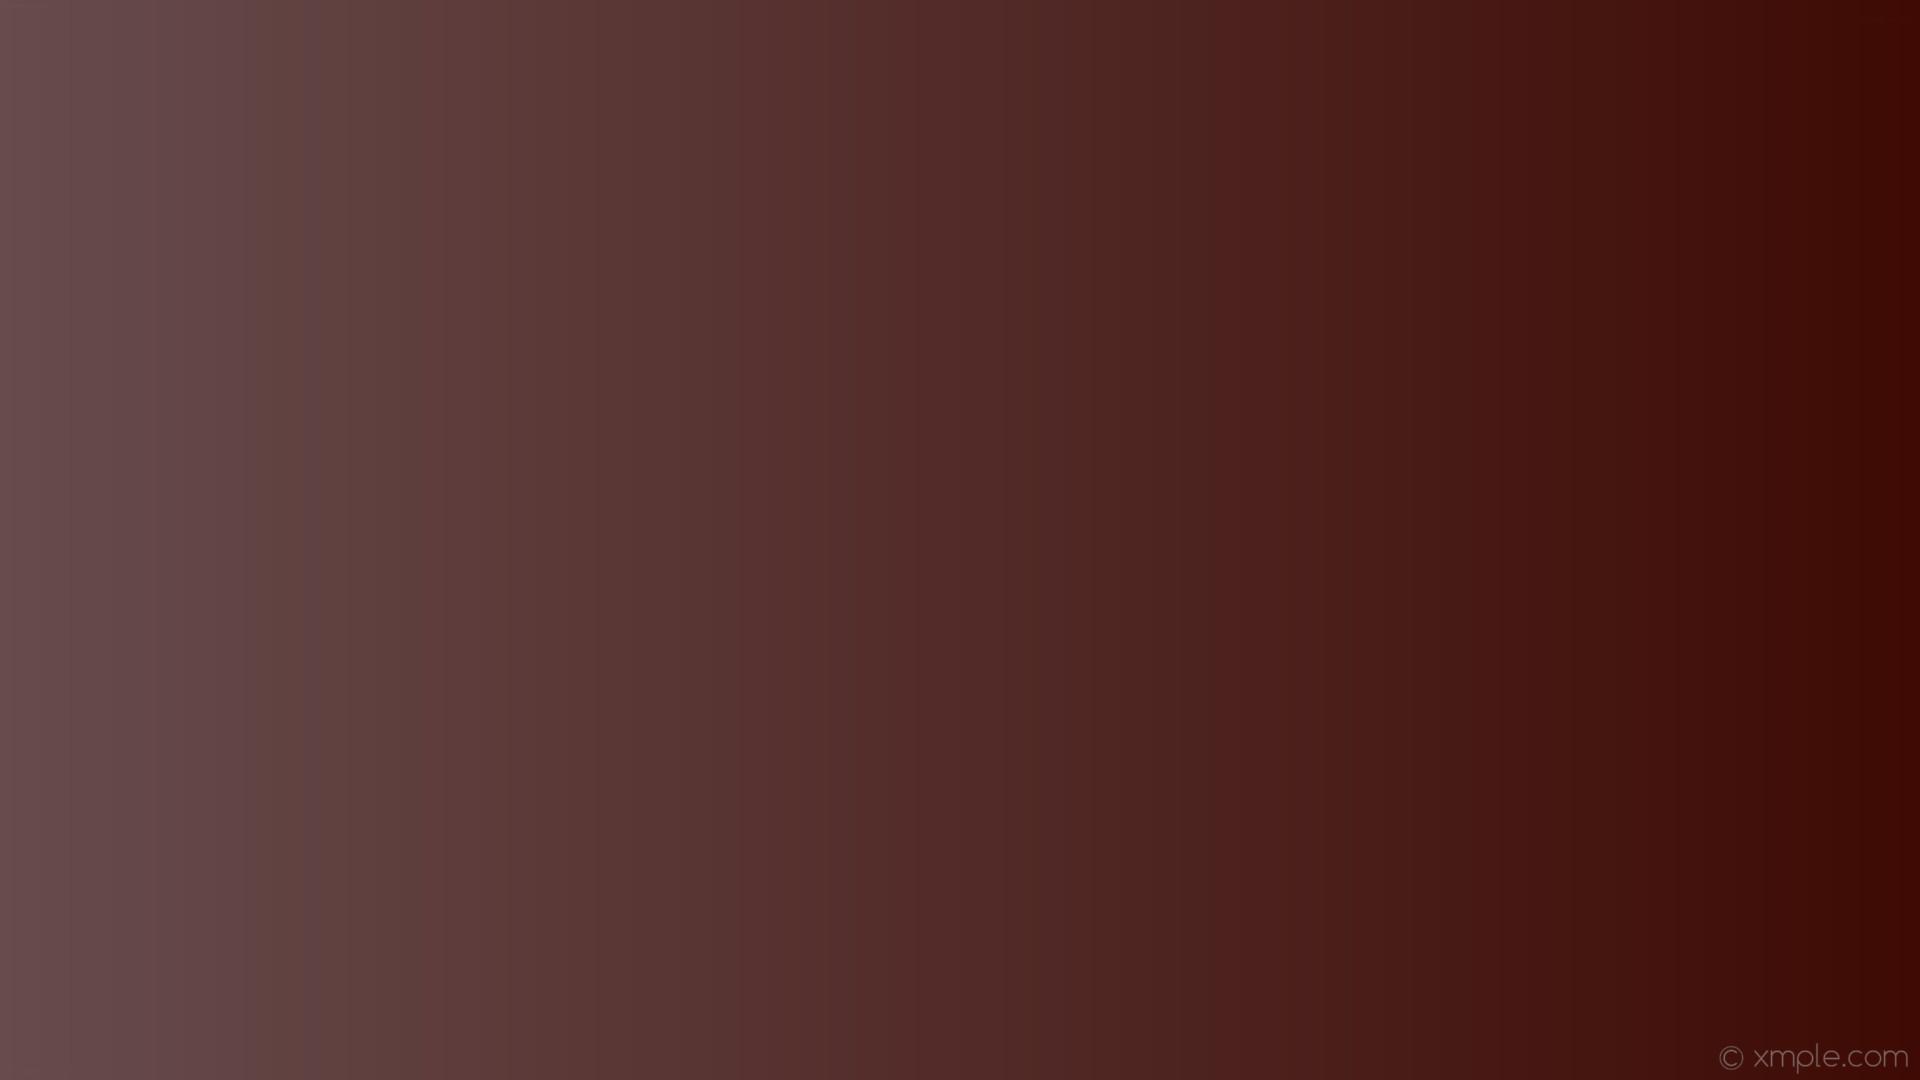 wallpaper red gradient linear dark red #3e0a03 #674c4d 0°